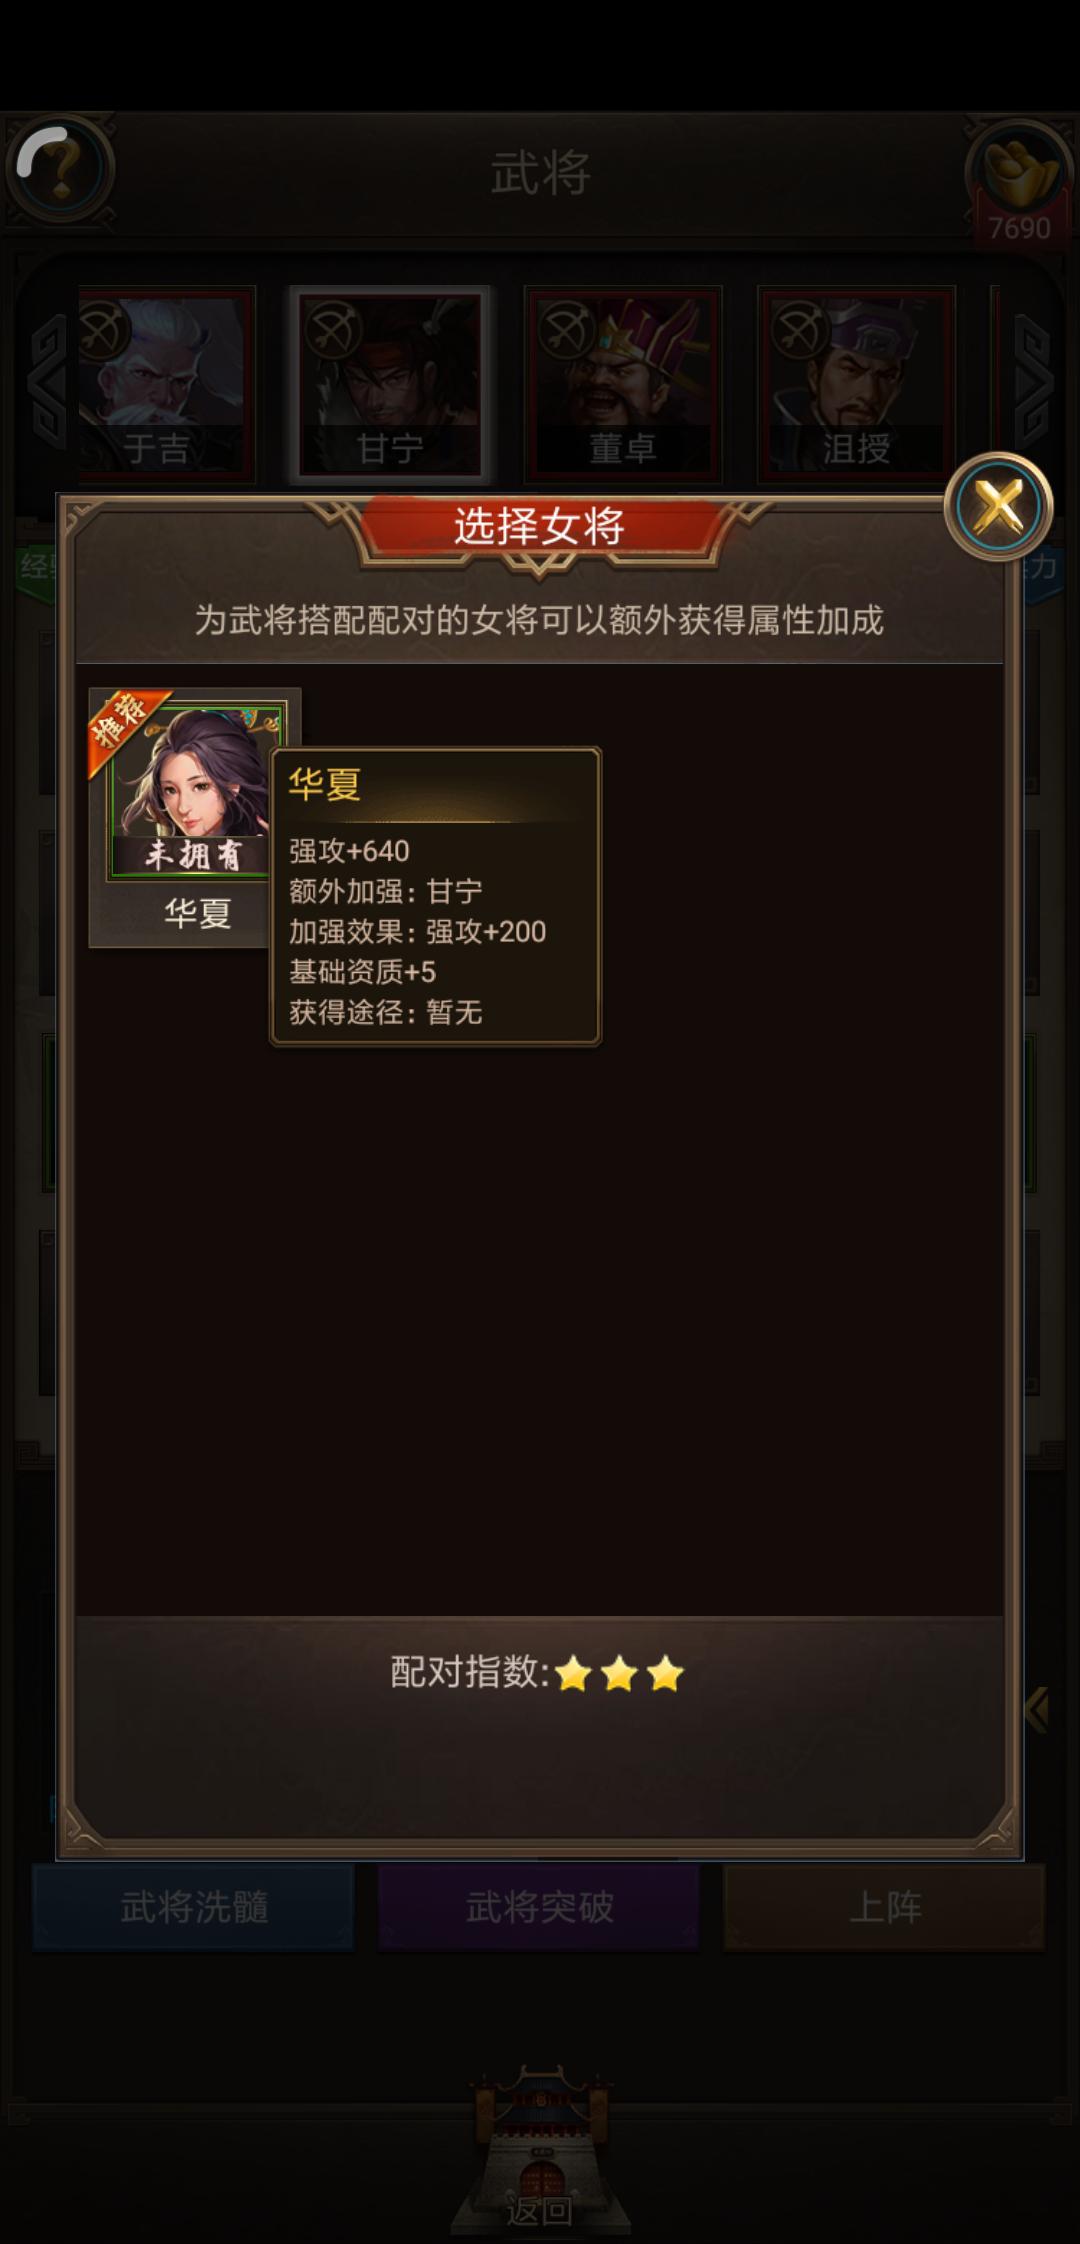 Screenshot_2019-03-30-20-13-10-660_com.jedigames..png